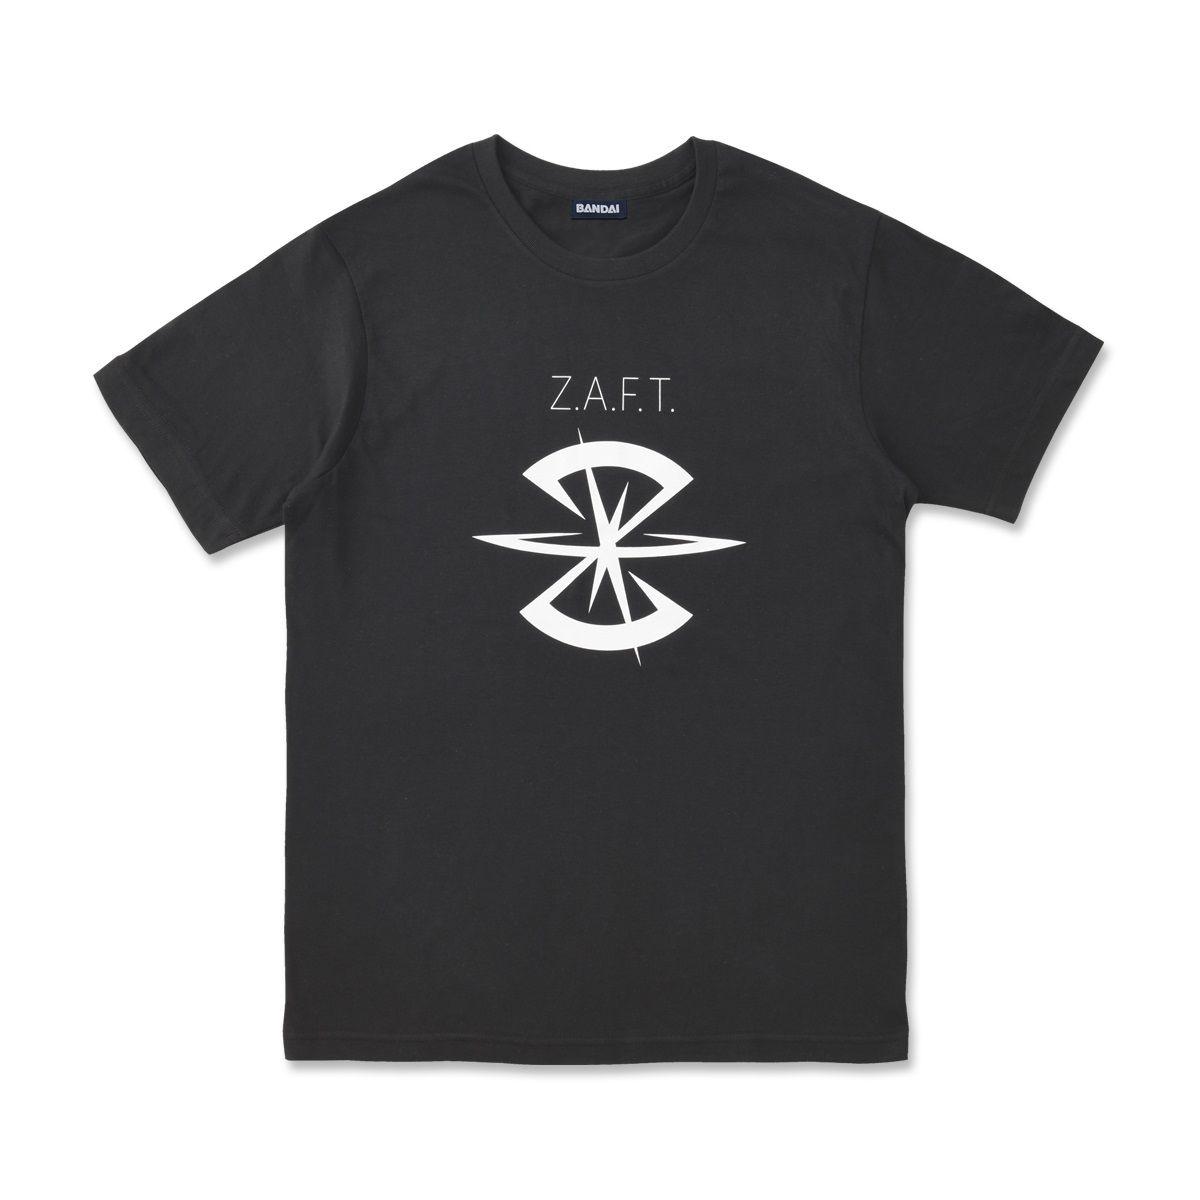 Mobile Suit Gundam SEED ZAFT Emblem T-shirt